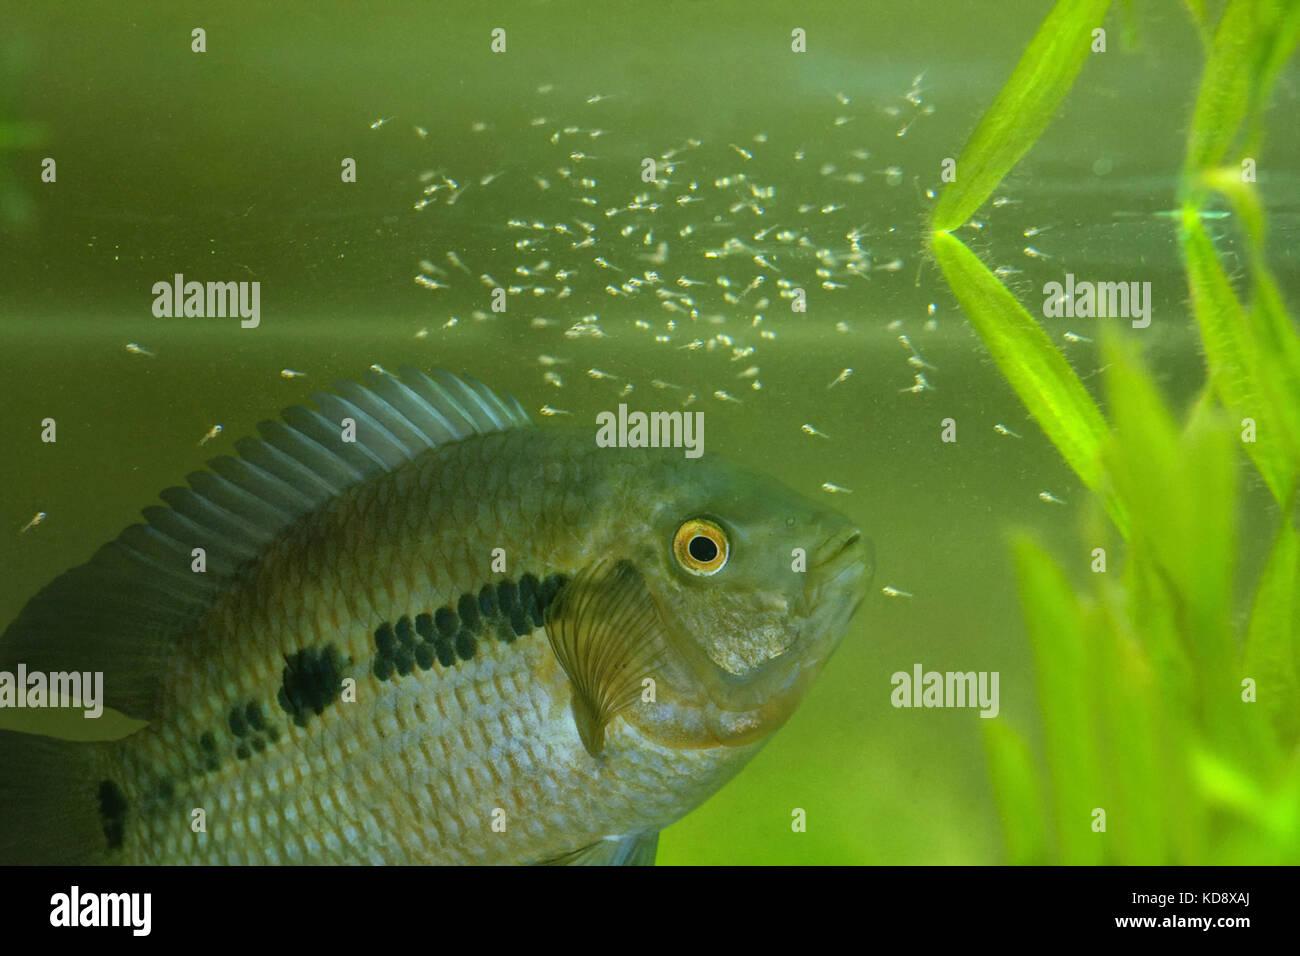 Chameleon cichlid, Australoheros facetus. Male guarding fry in aquarium. Both parent guard larvae and juveniles - Stock Image